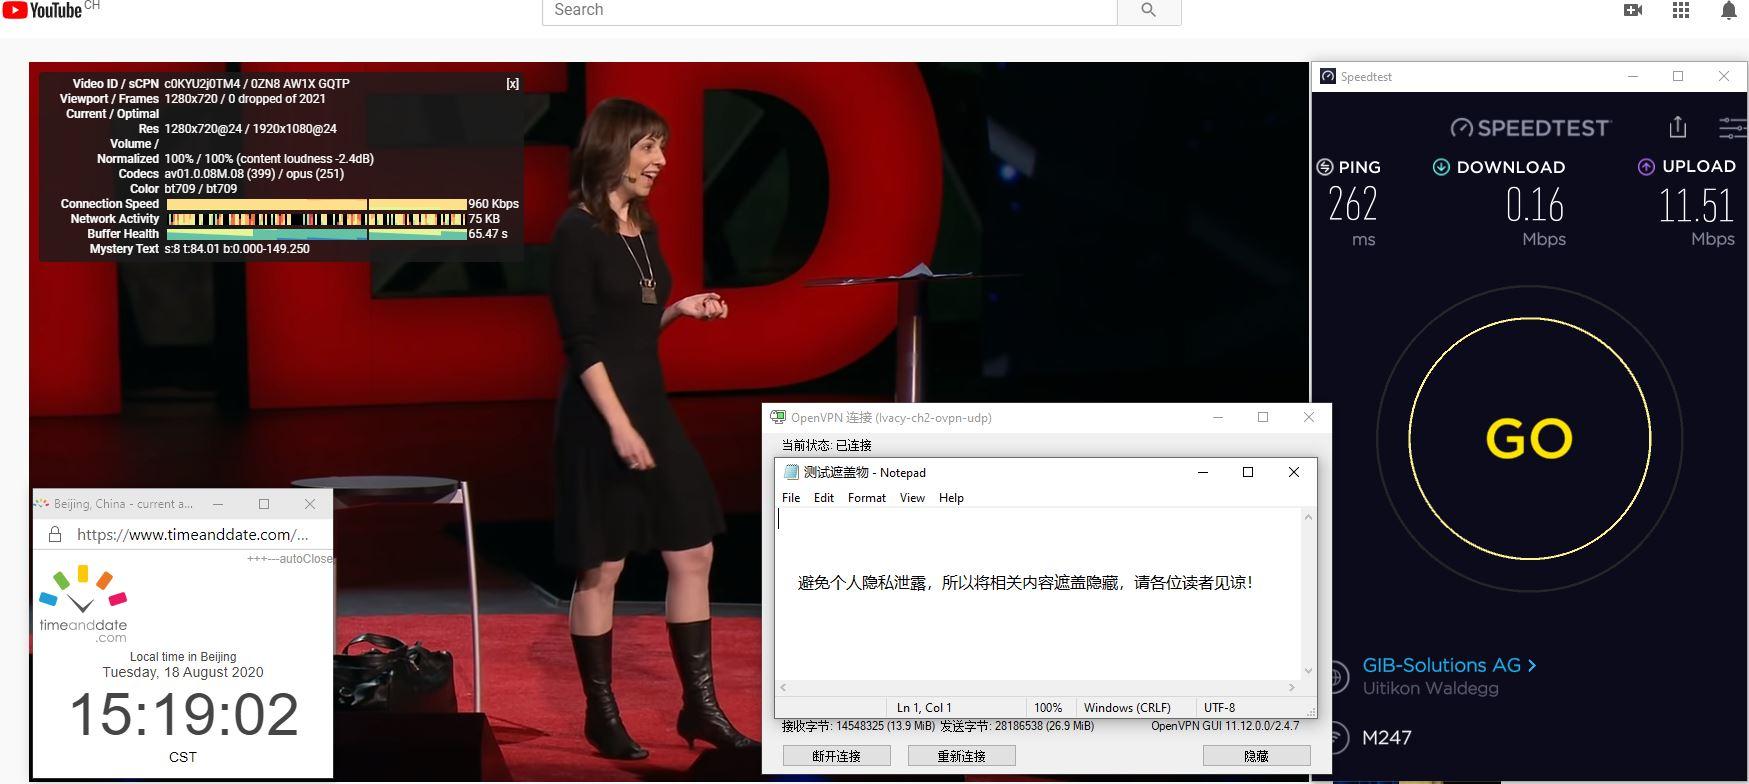 Windows10 IvacyVPN OpenVPN ch2 中国VPN 翻墙 科学上网 翻墙速度测试 - 20200818